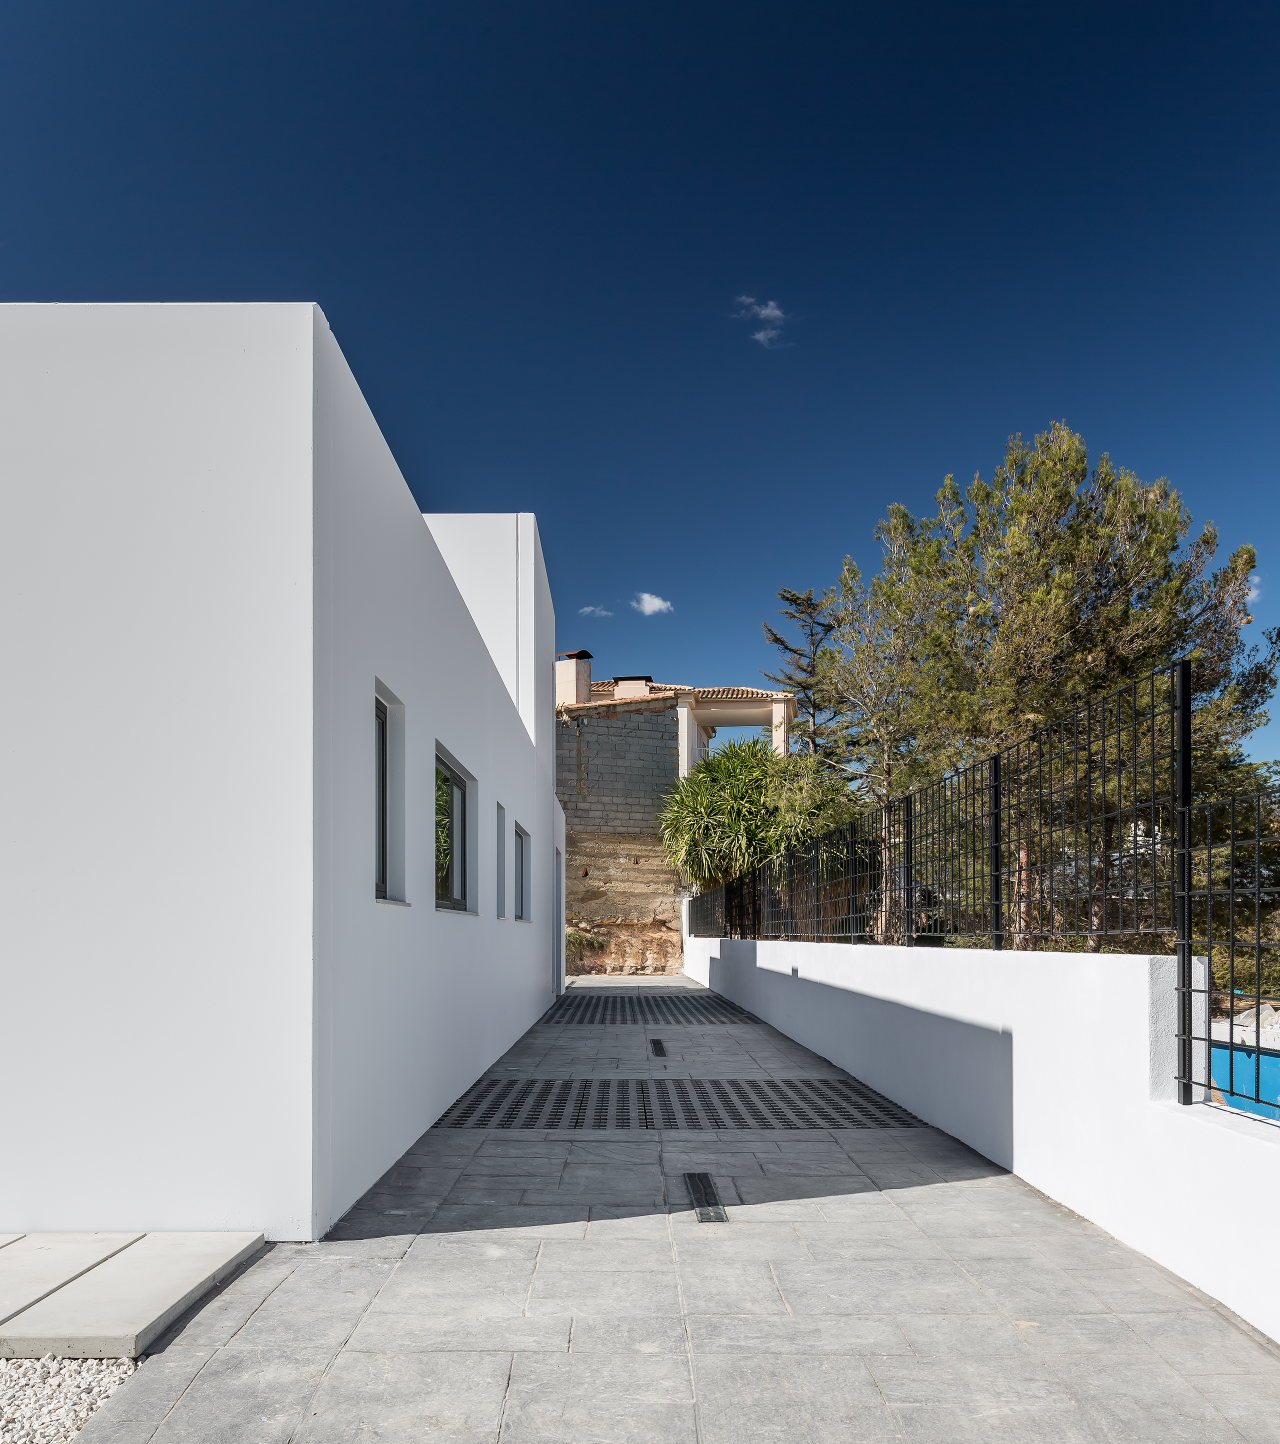 fotografia-arquitectura-valencia-german-cabo-viraje-el-vedat-torrent (8)